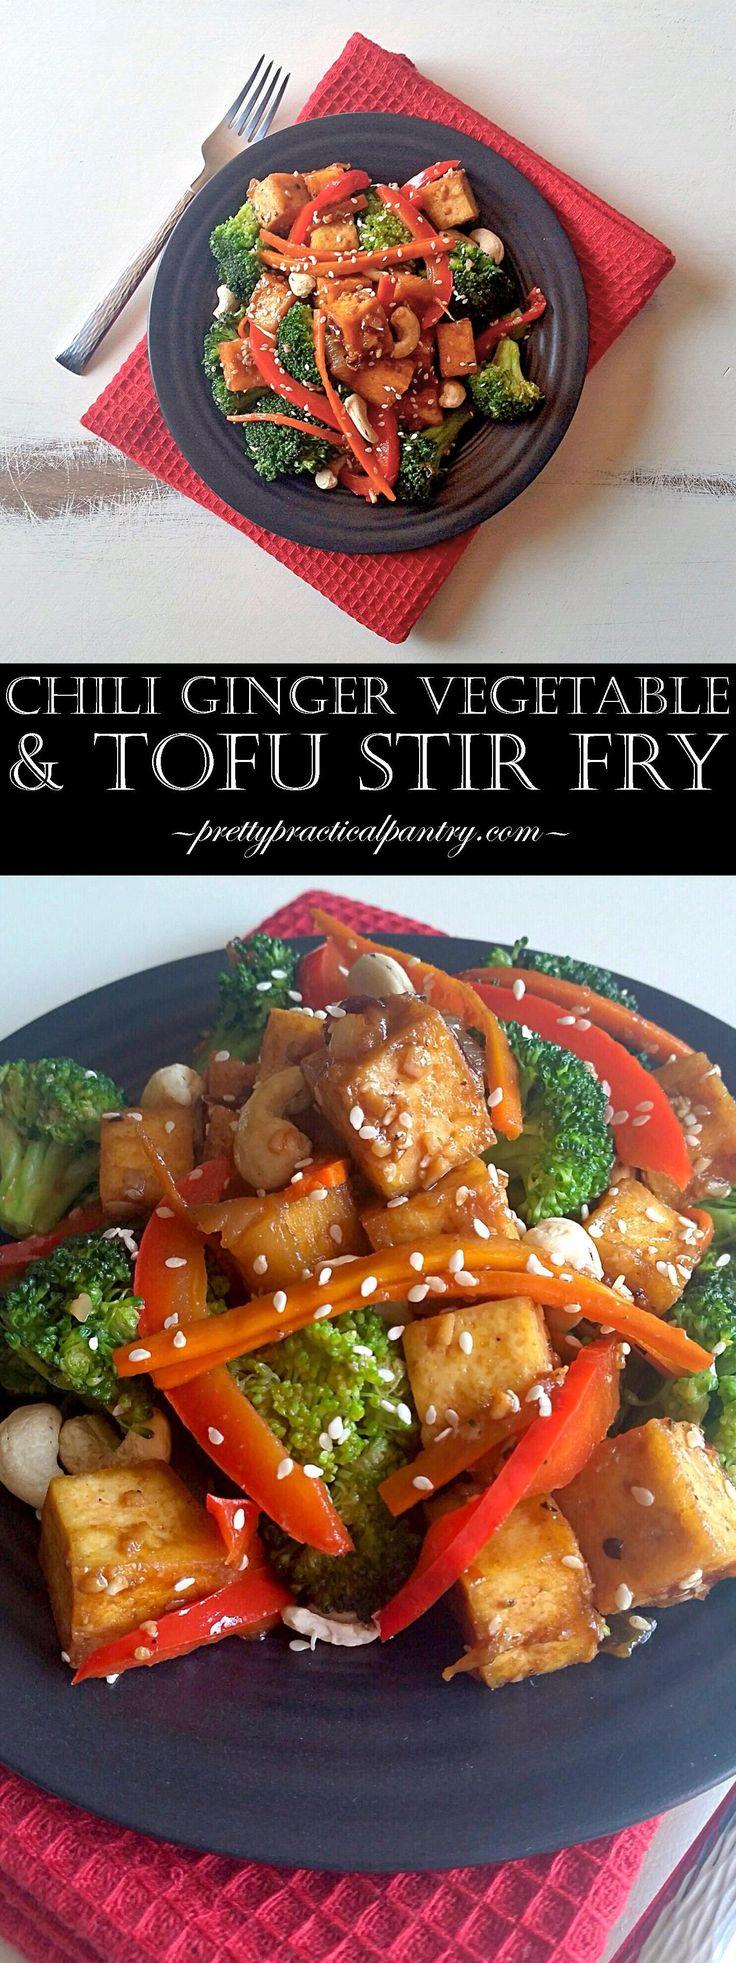 Chili Ginger Vegetable & Tofu Stir Fry... garlic, onions, chili powder, and lots of ginger!!